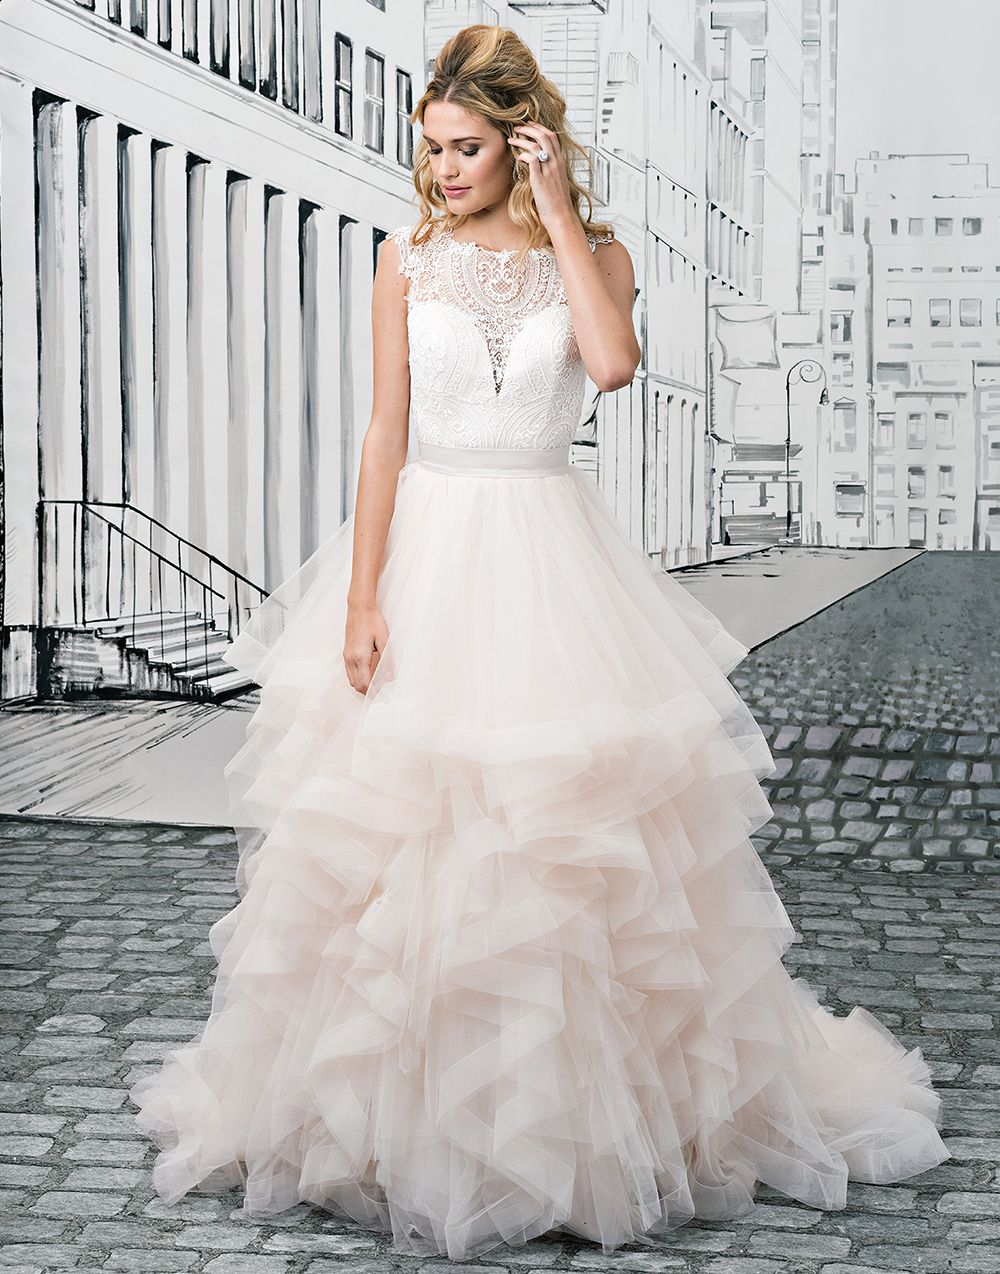 hitchin wedding dress shops » Wedding Dresses Designs, Ideas and ...